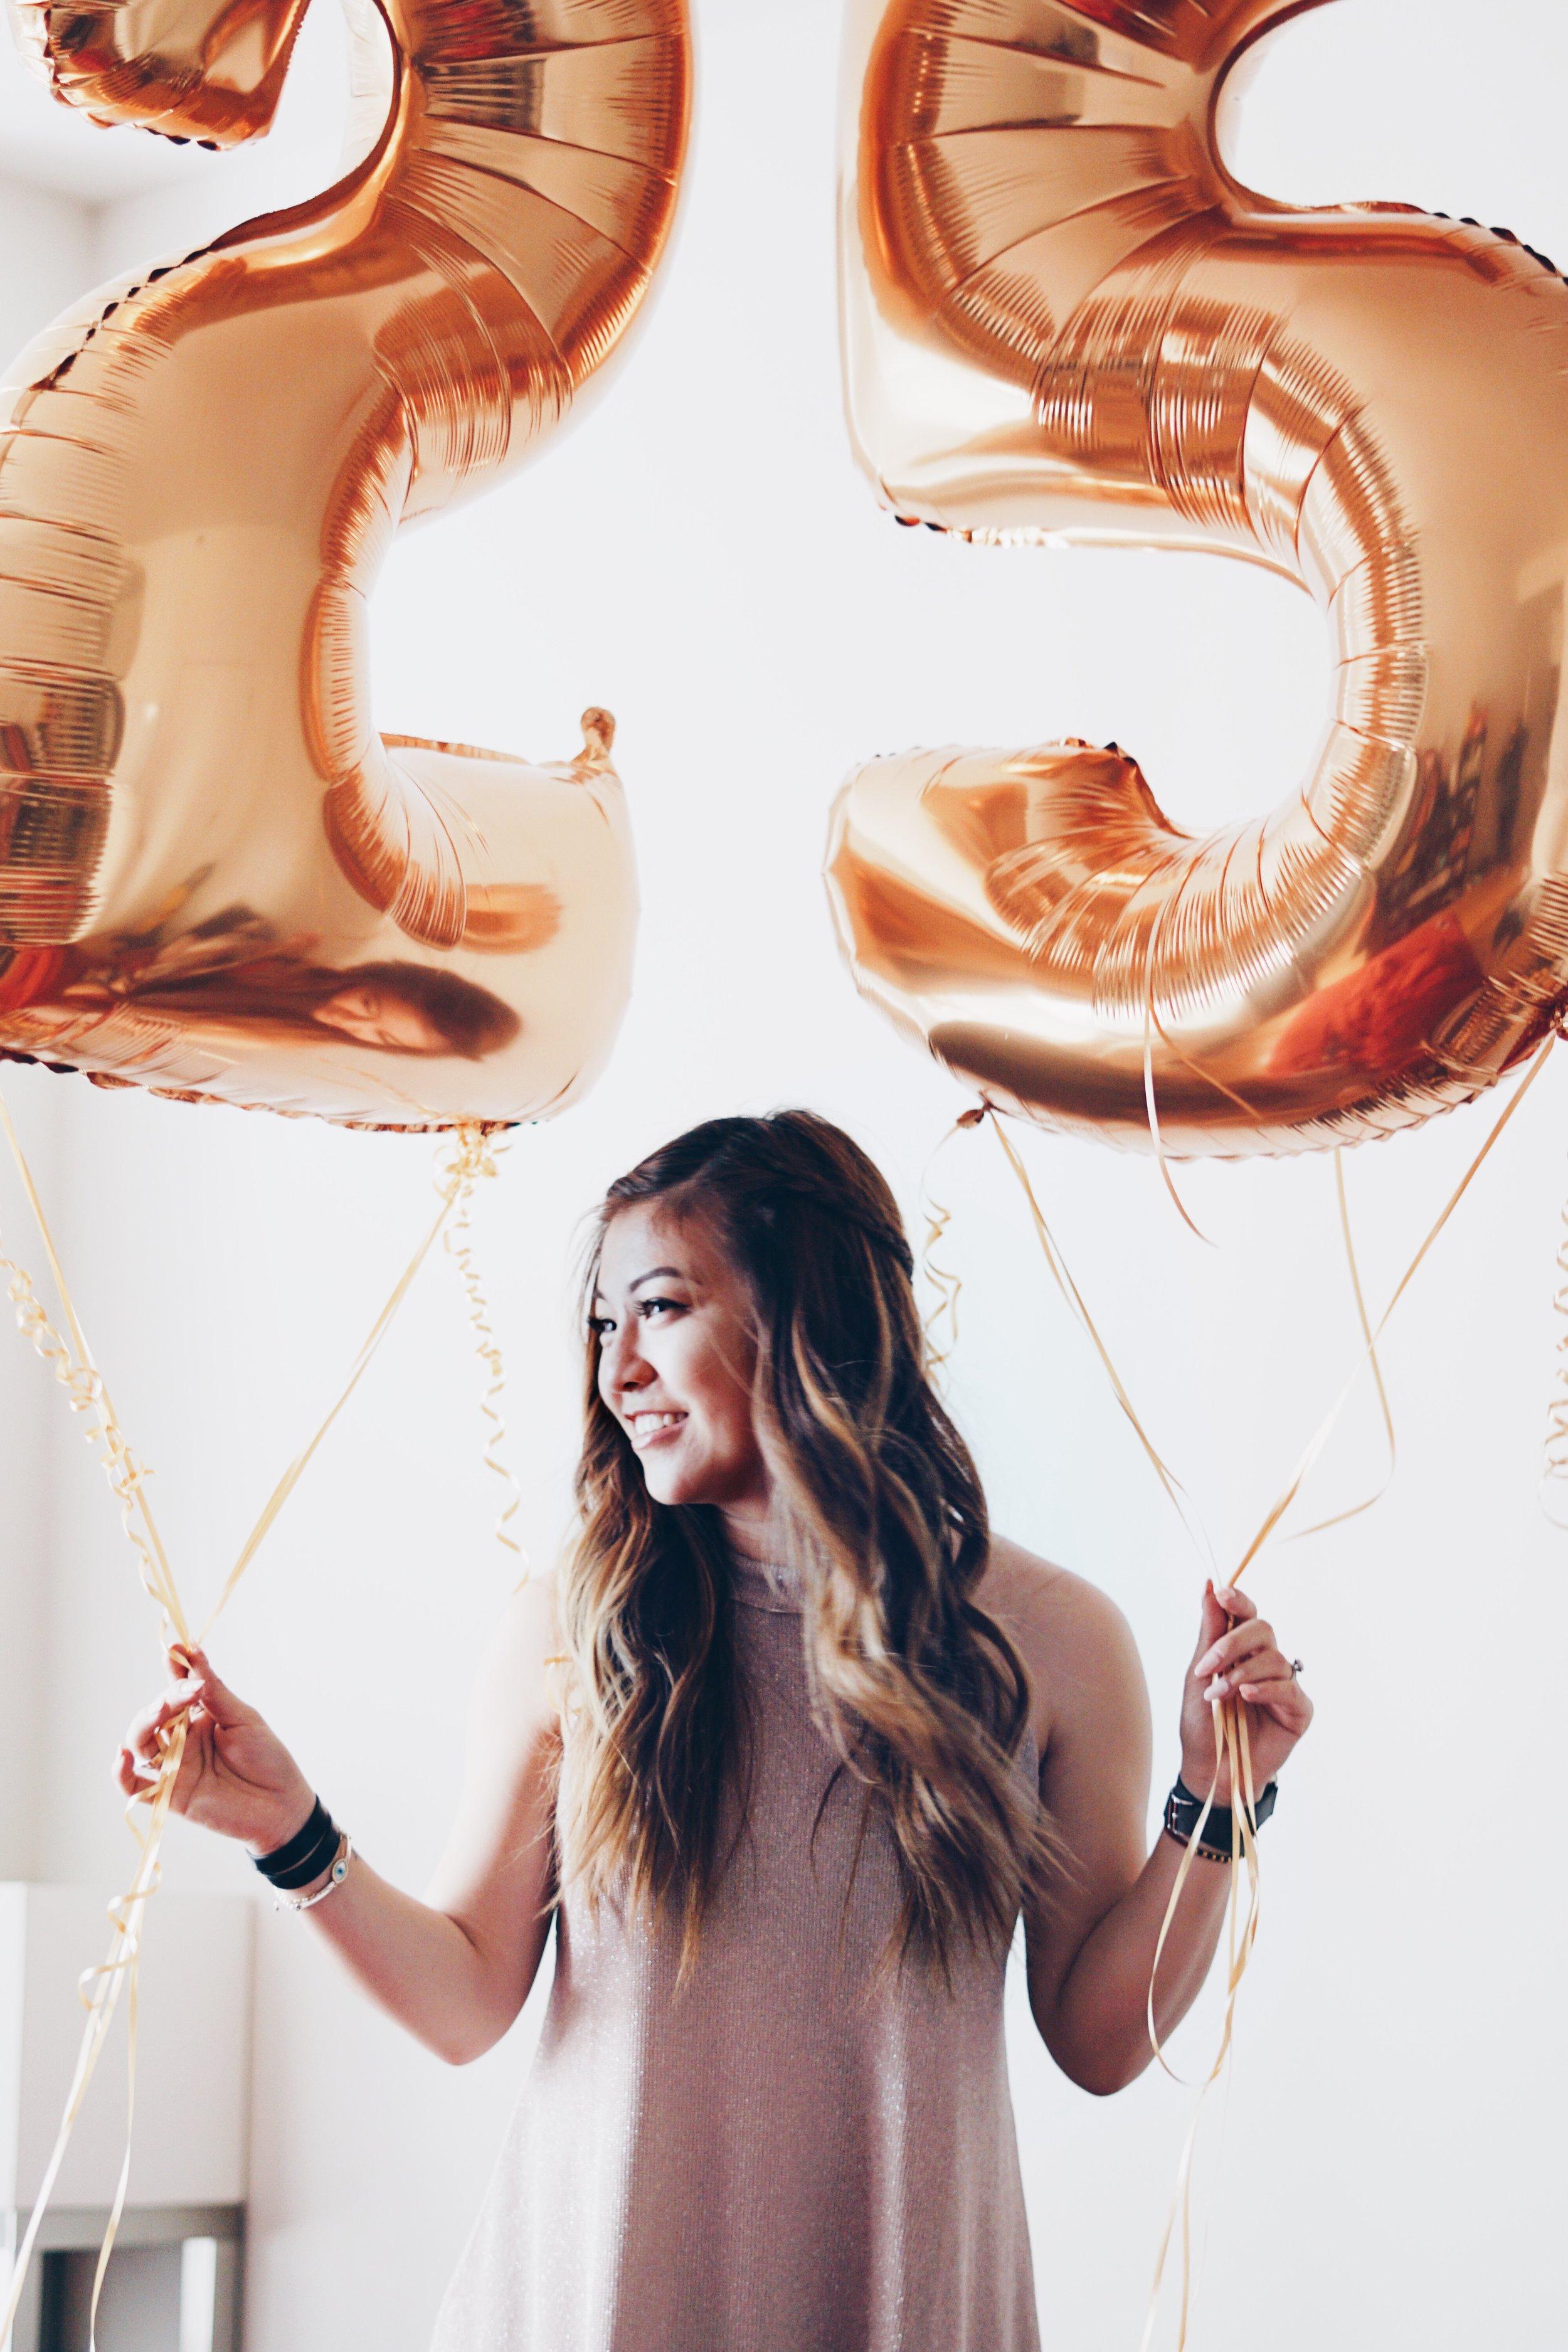 Dress:  Tobi  Jewelry & Watch: Hermes   Balloons:  Balloon Kings